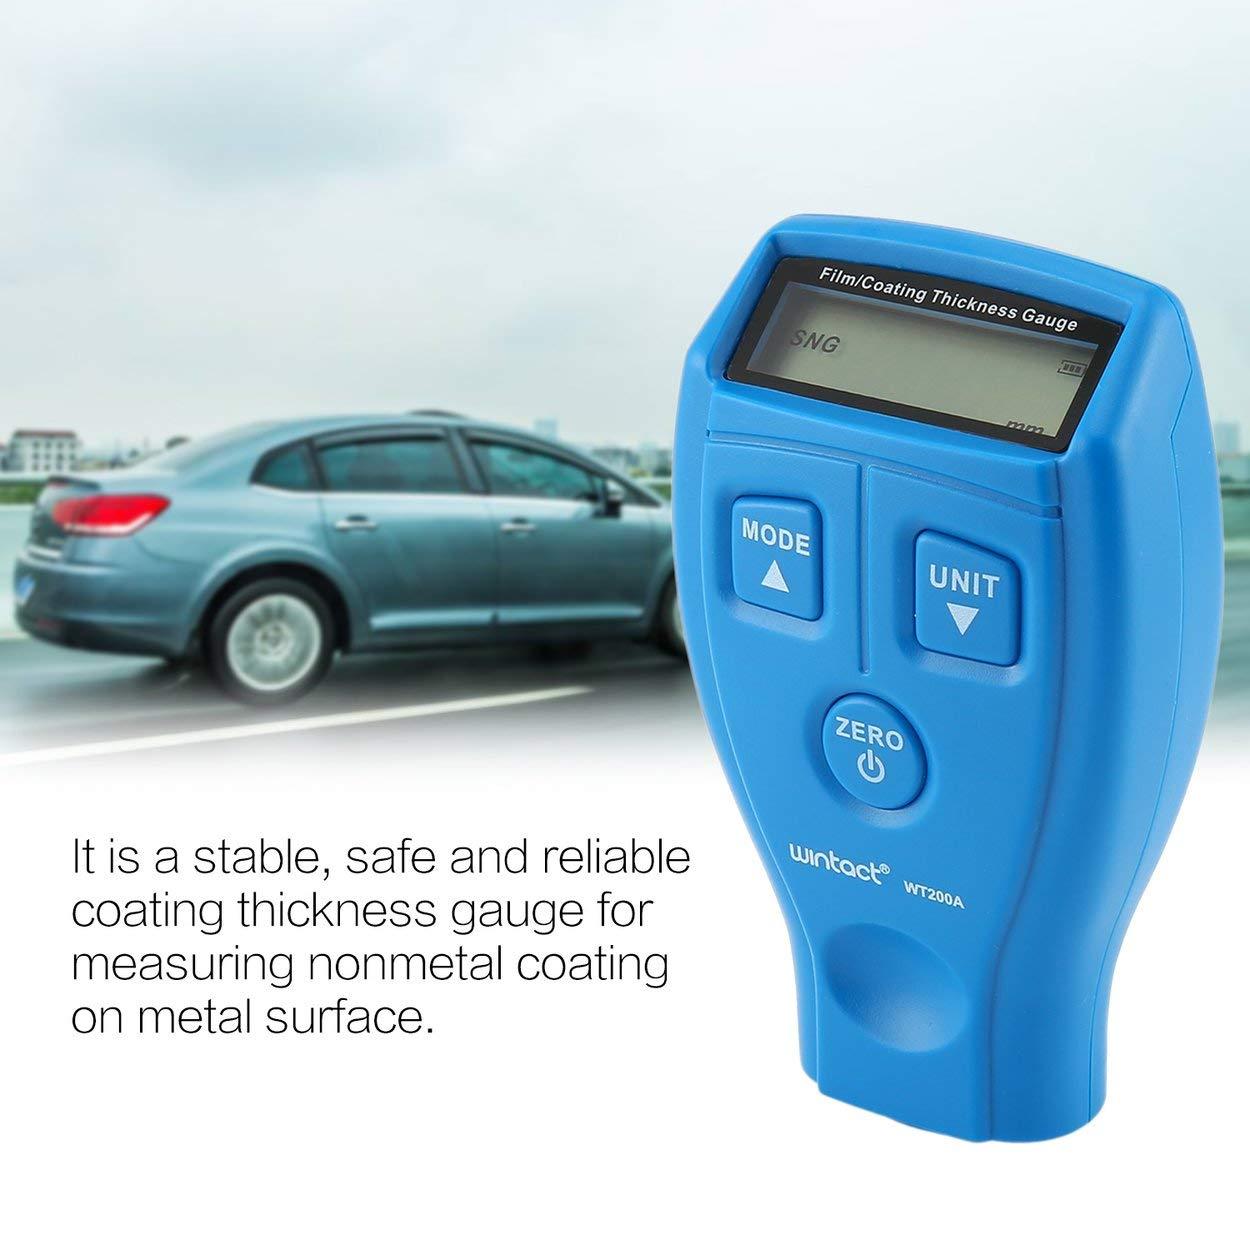 Lorenlli Fit WINTACT WT200A Mini Digitaler Beschichtungsfilm Eisendickenmessgerät Auto Meter Paint Painting Tester Handheld Testing 0-1.80mm